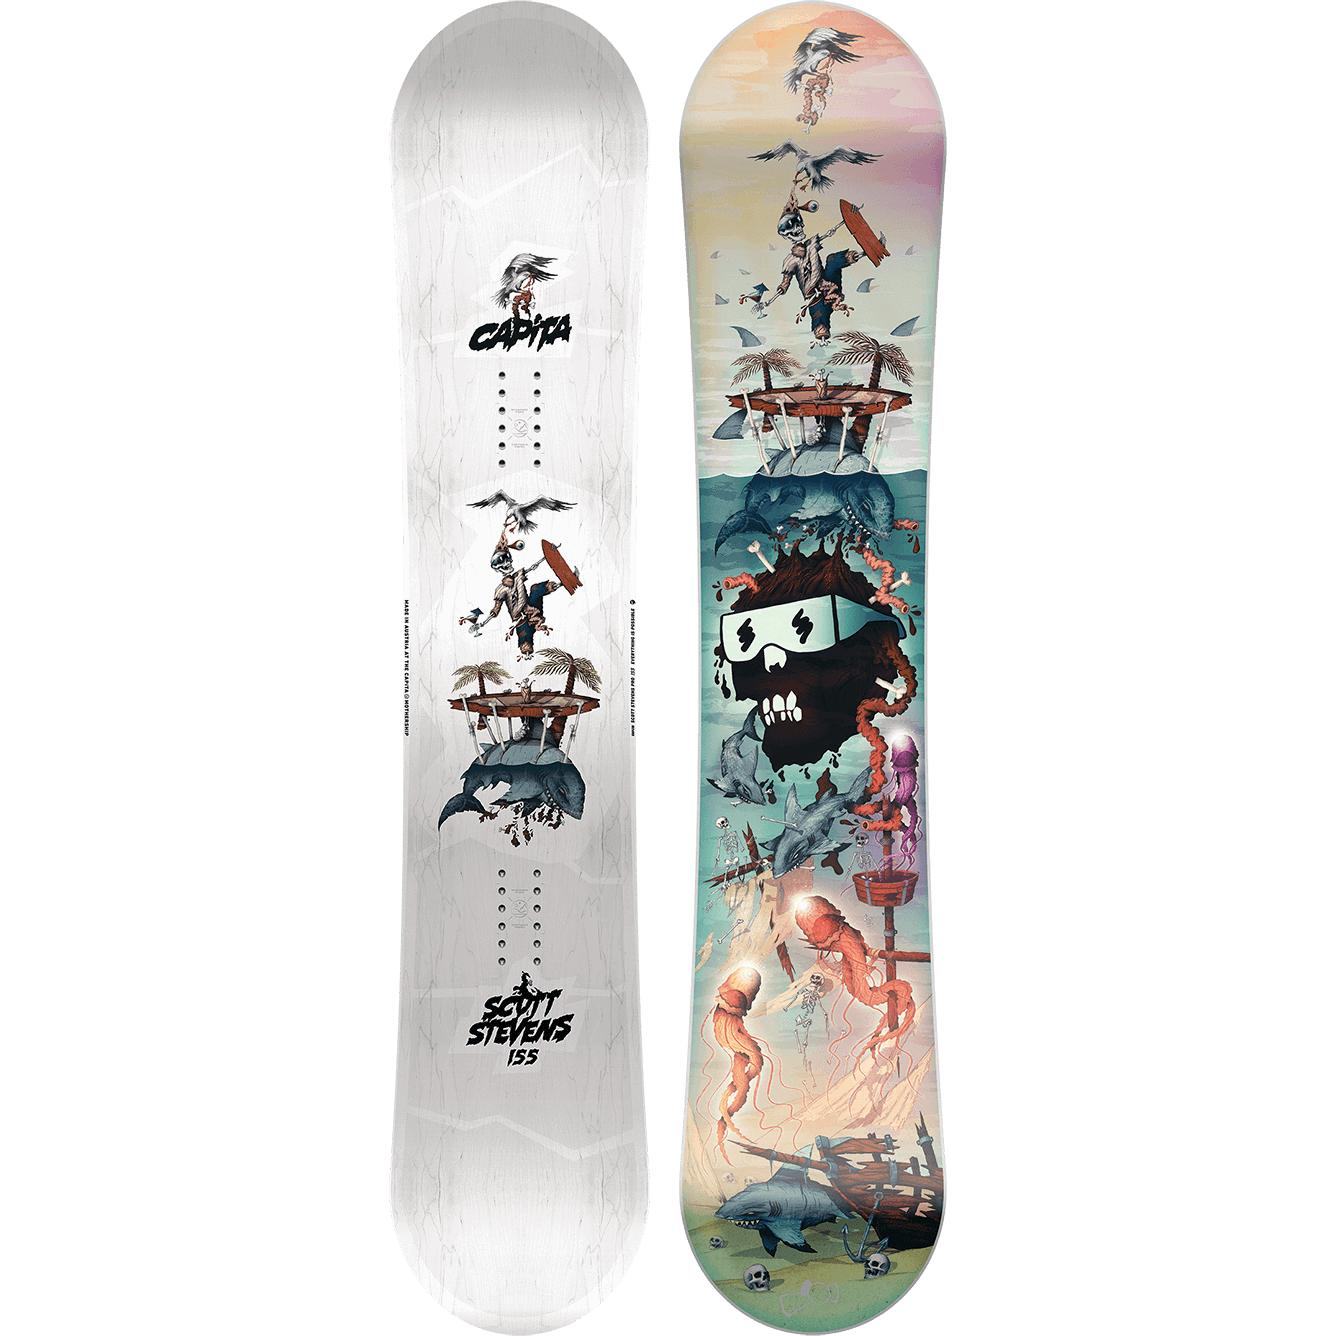 Capita Scott Stevens Pro Snowboard Snowboard Pro Snowboarders Snowboarding